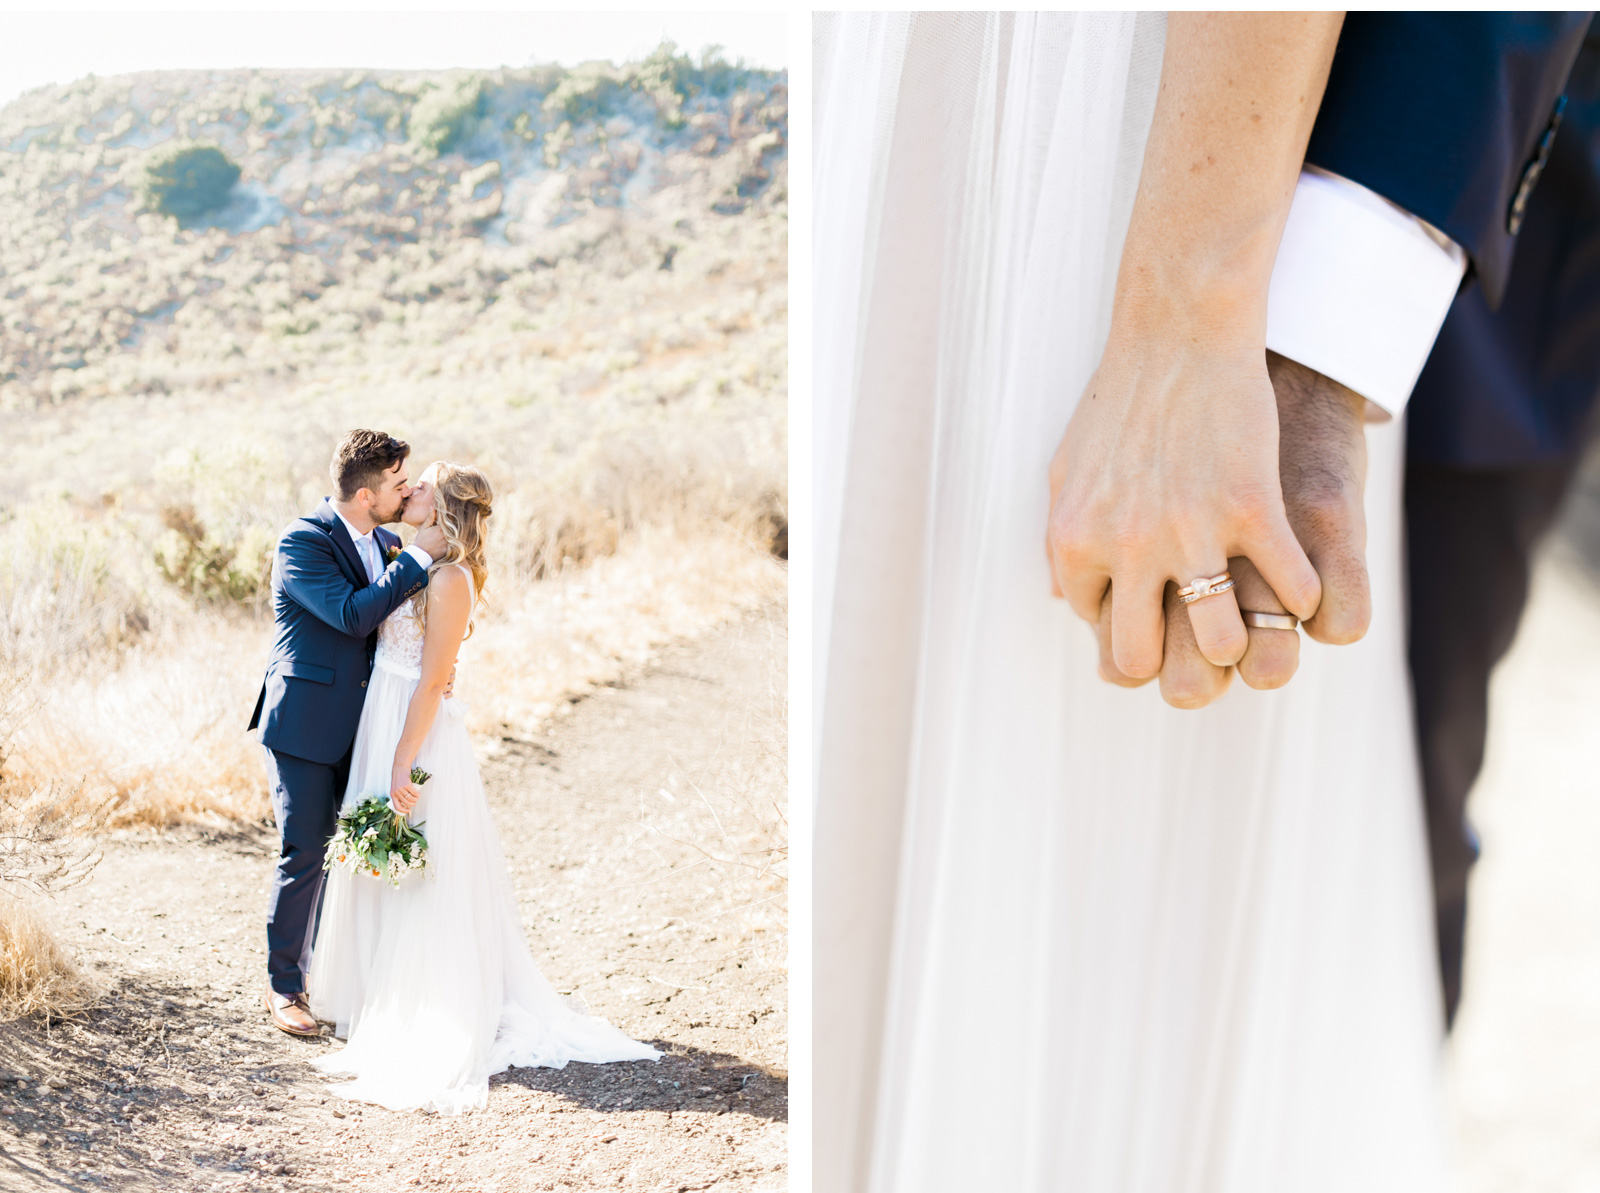 San-Luis-Obispo-Wedding-Show-Me-Your-Mumu-Natalie-Schutt-Photography_03.jpg